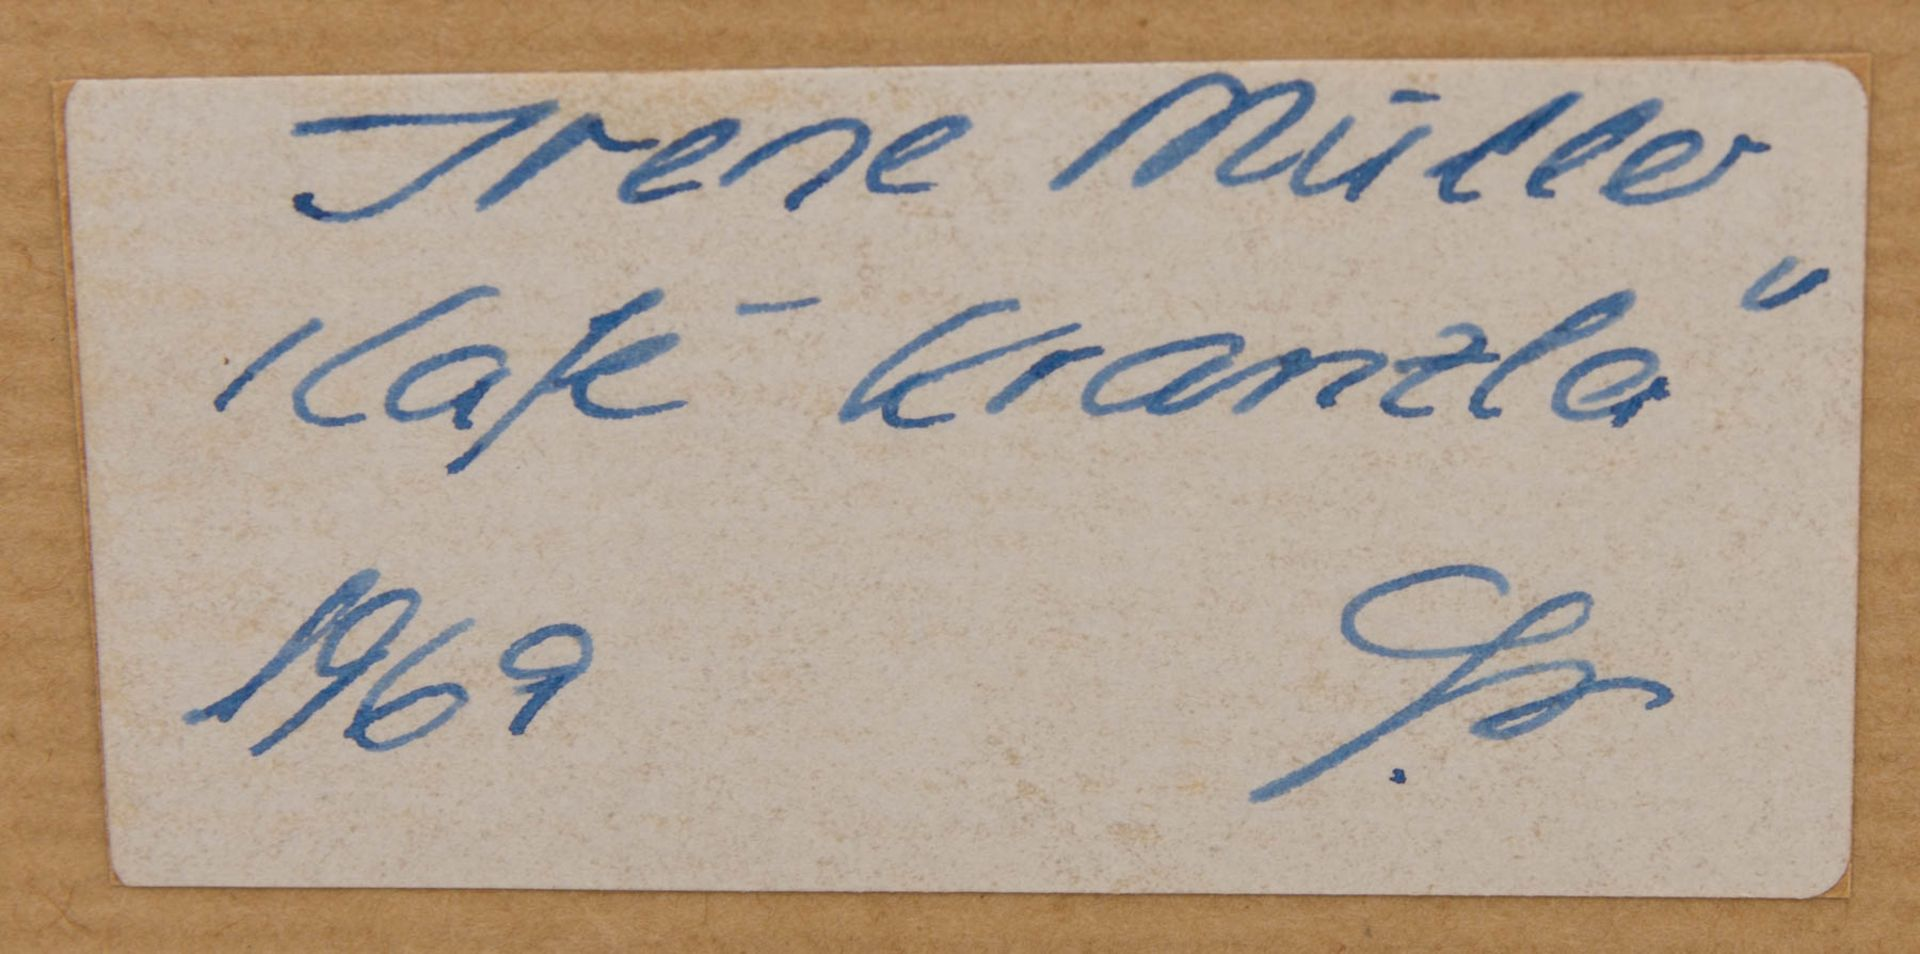 Irene Müller, Kaffeehaus Szene, Radierung, 1969.Irene Müller (1941).Unten rechts - Bild 6 aus 6